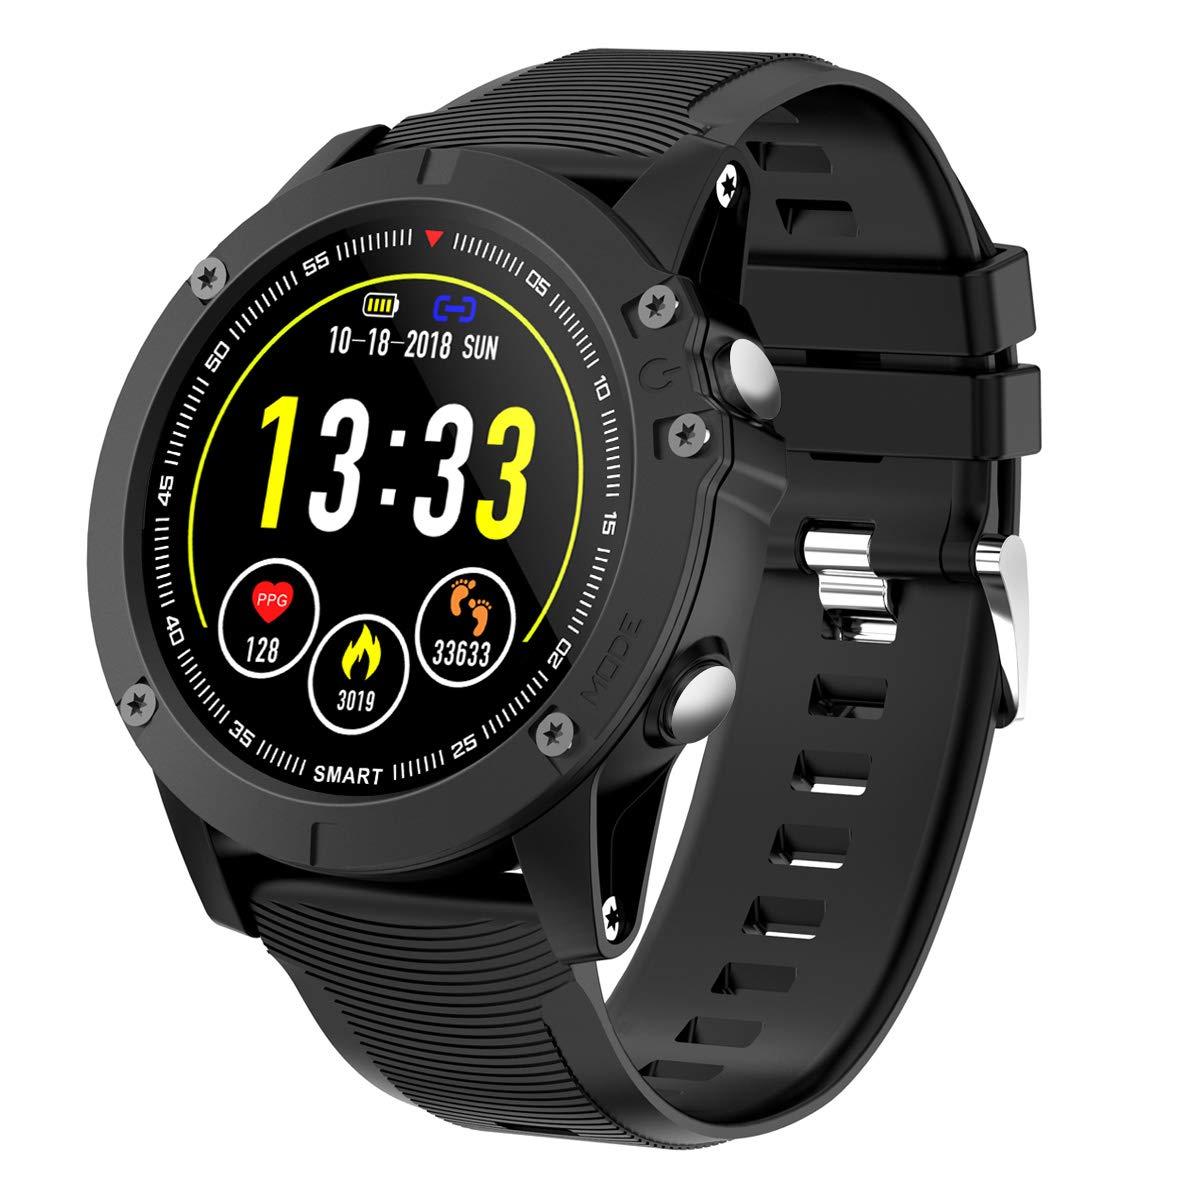 HolyHigh Reloj Inteligente Smart Watch Impermeable IP68 Reloj Deportivo Pulsera de Actividad Inteligente Hombre Mujer 1.3